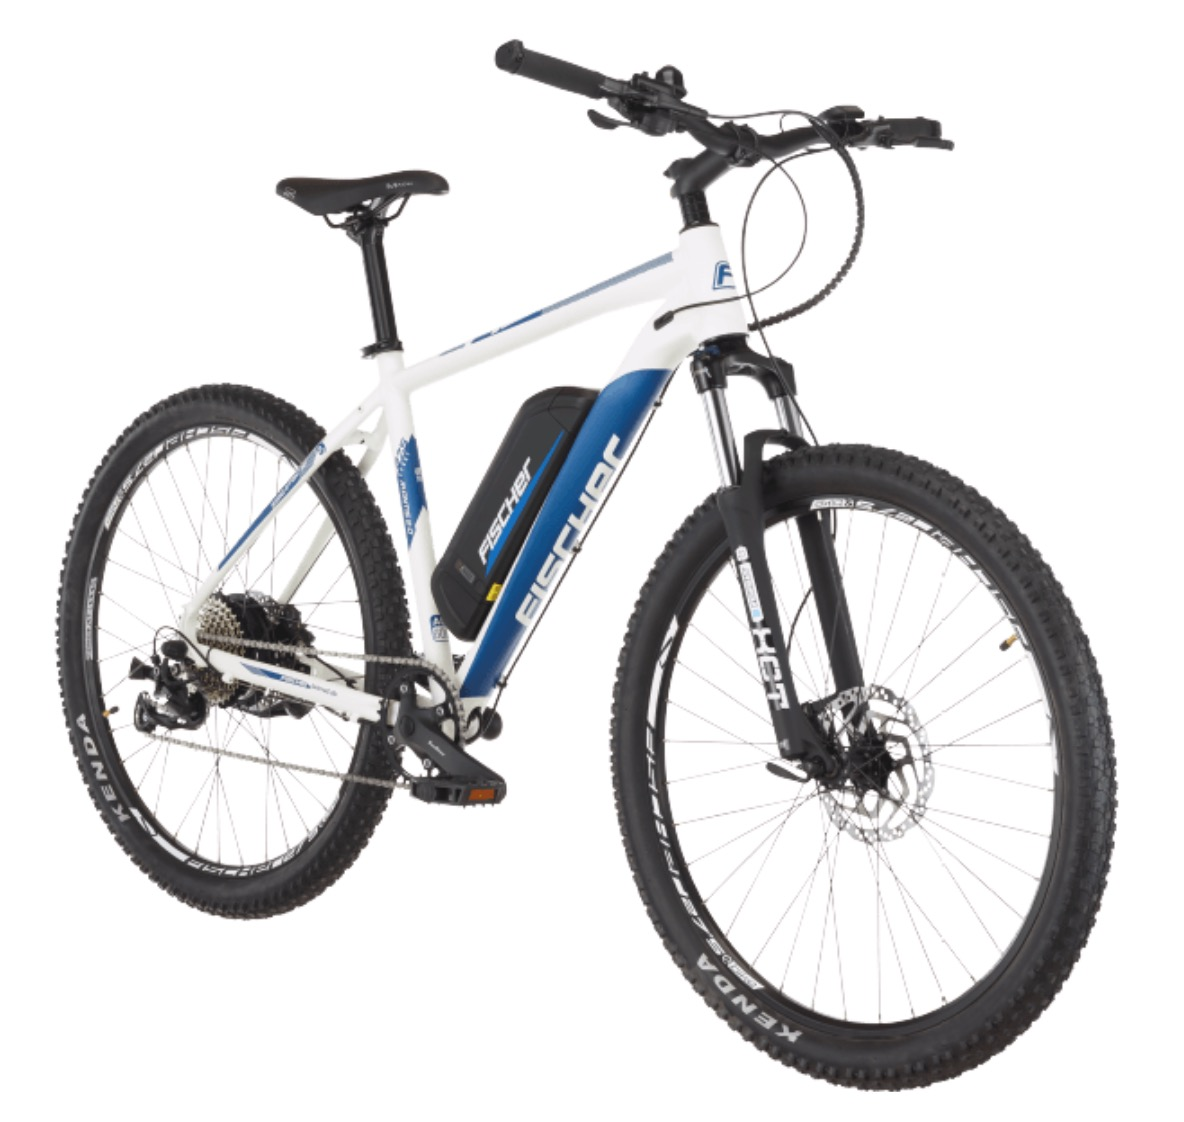 FISCHER MONTIS 2.0 E-Mountainbike